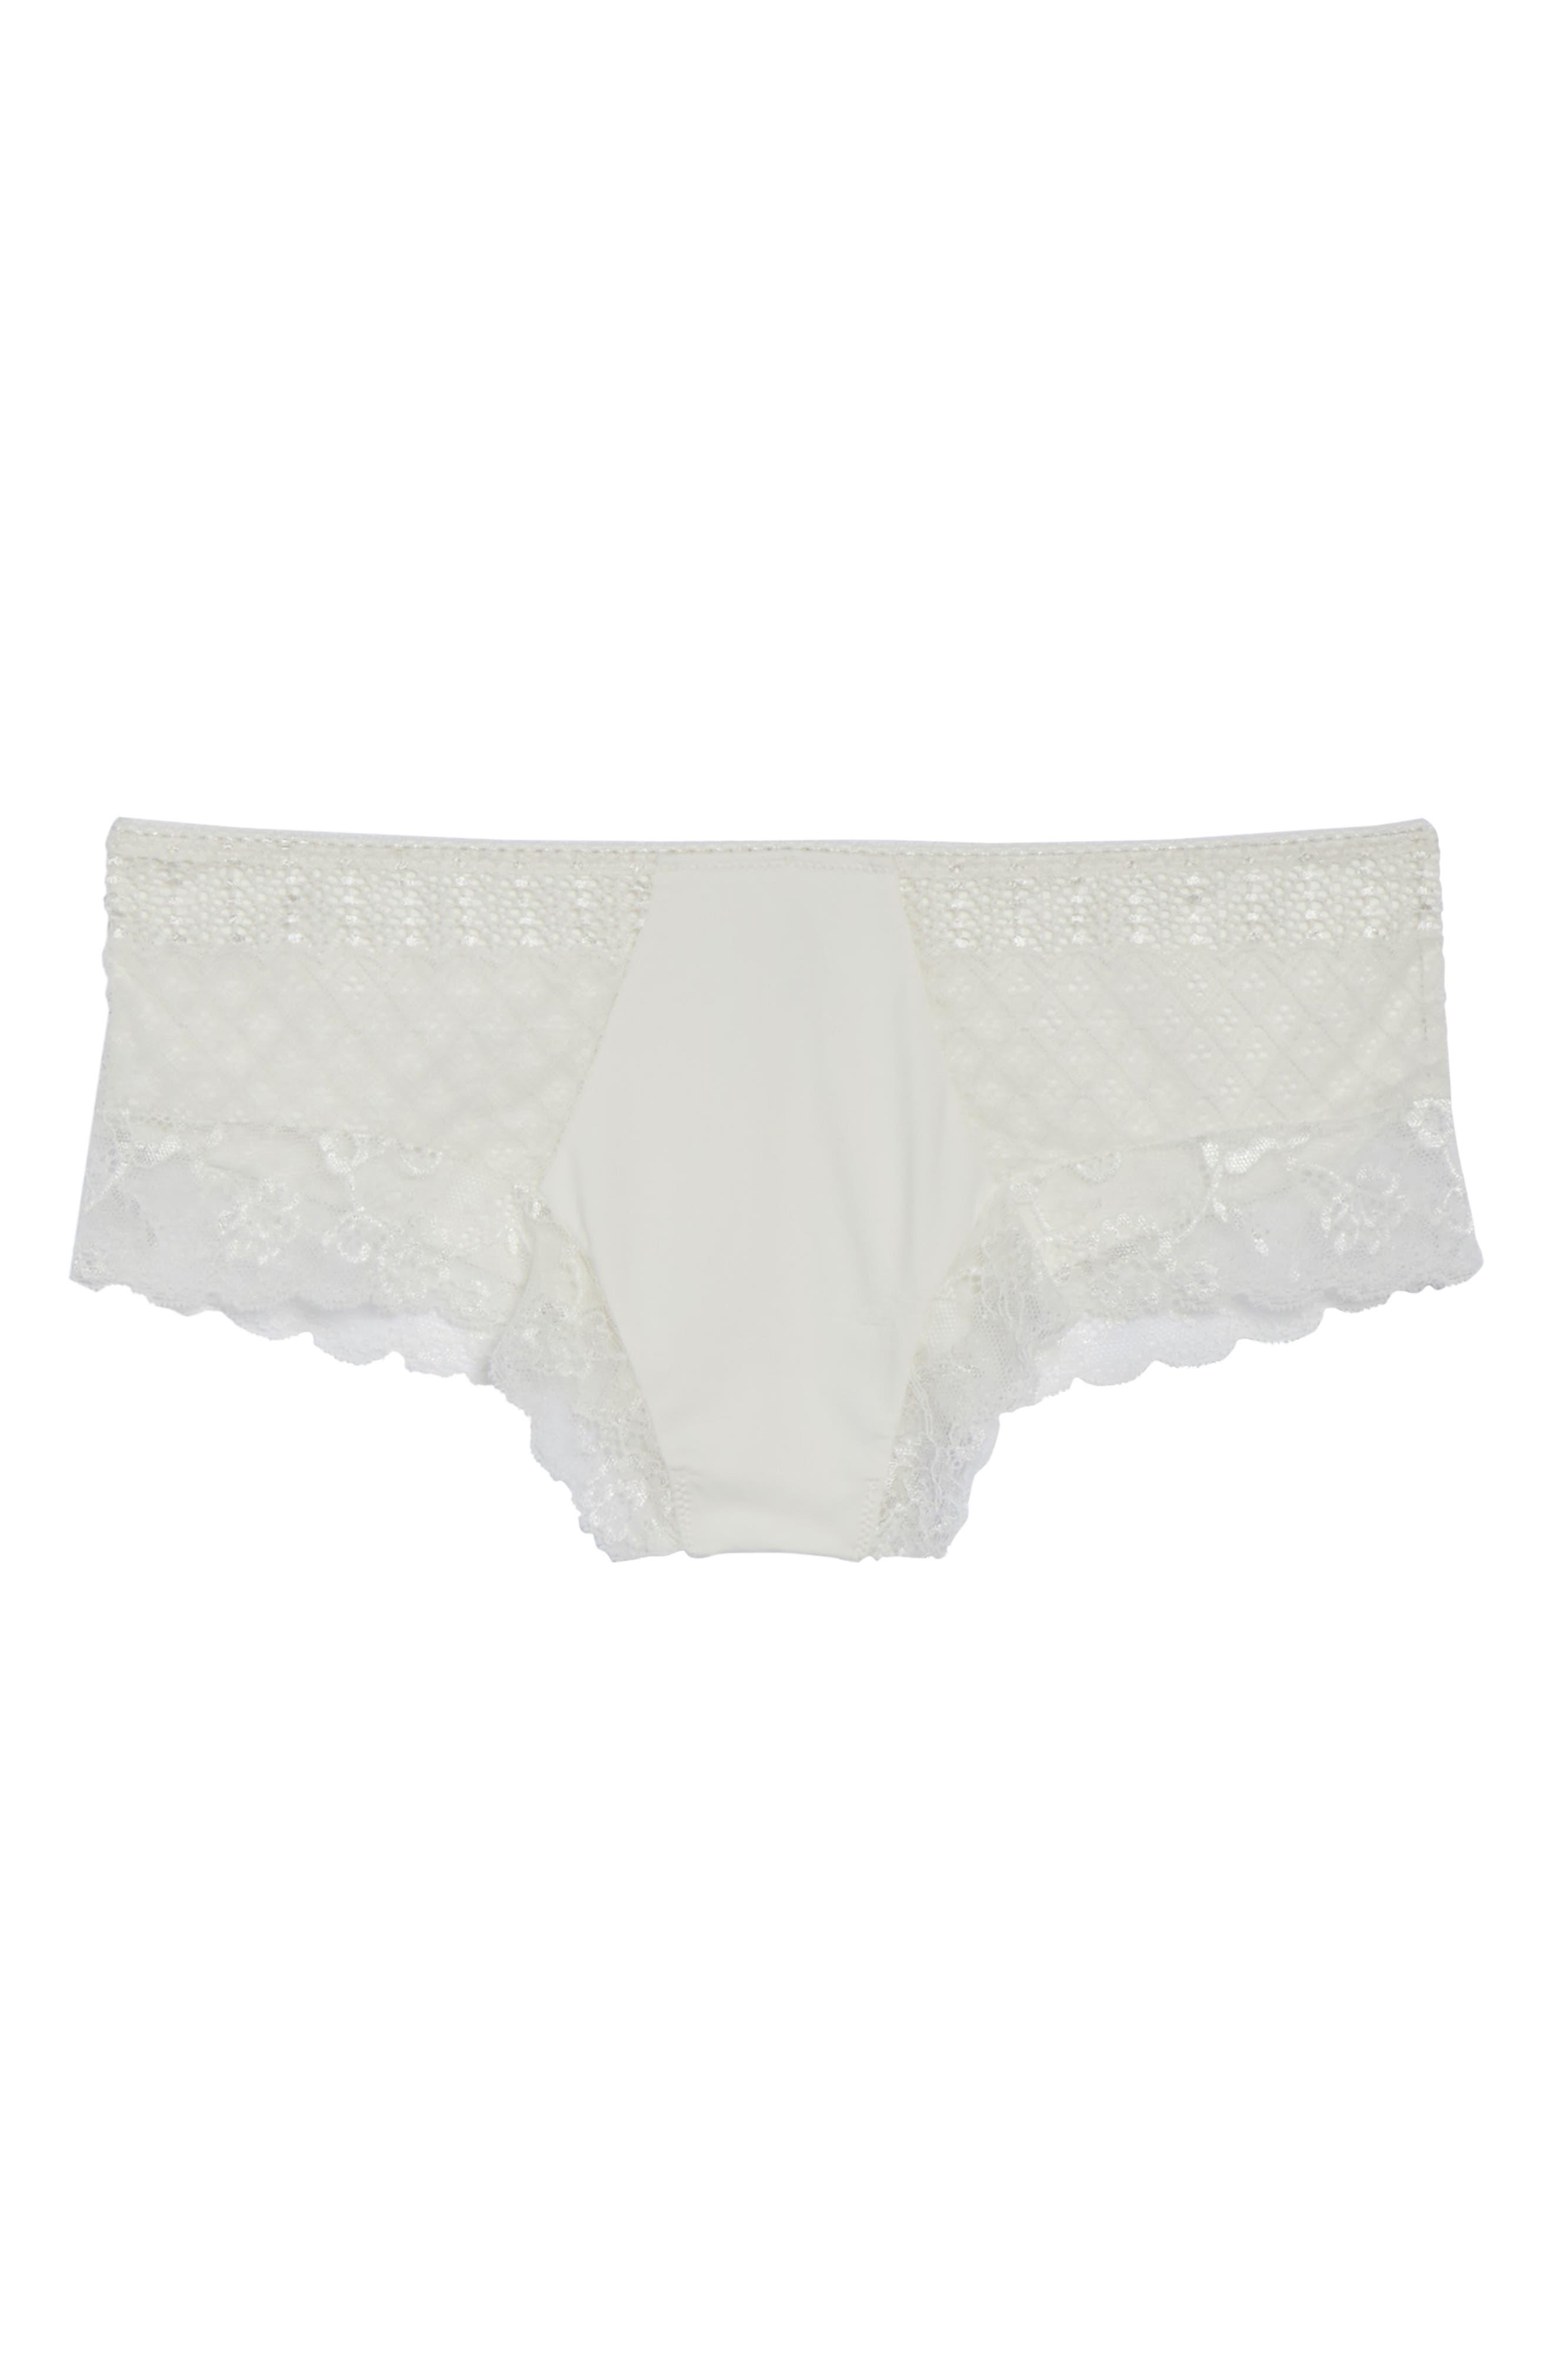 Honeydew Microfiber & Lace Hipster Panties,                             Alternate thumbnail 15, color,